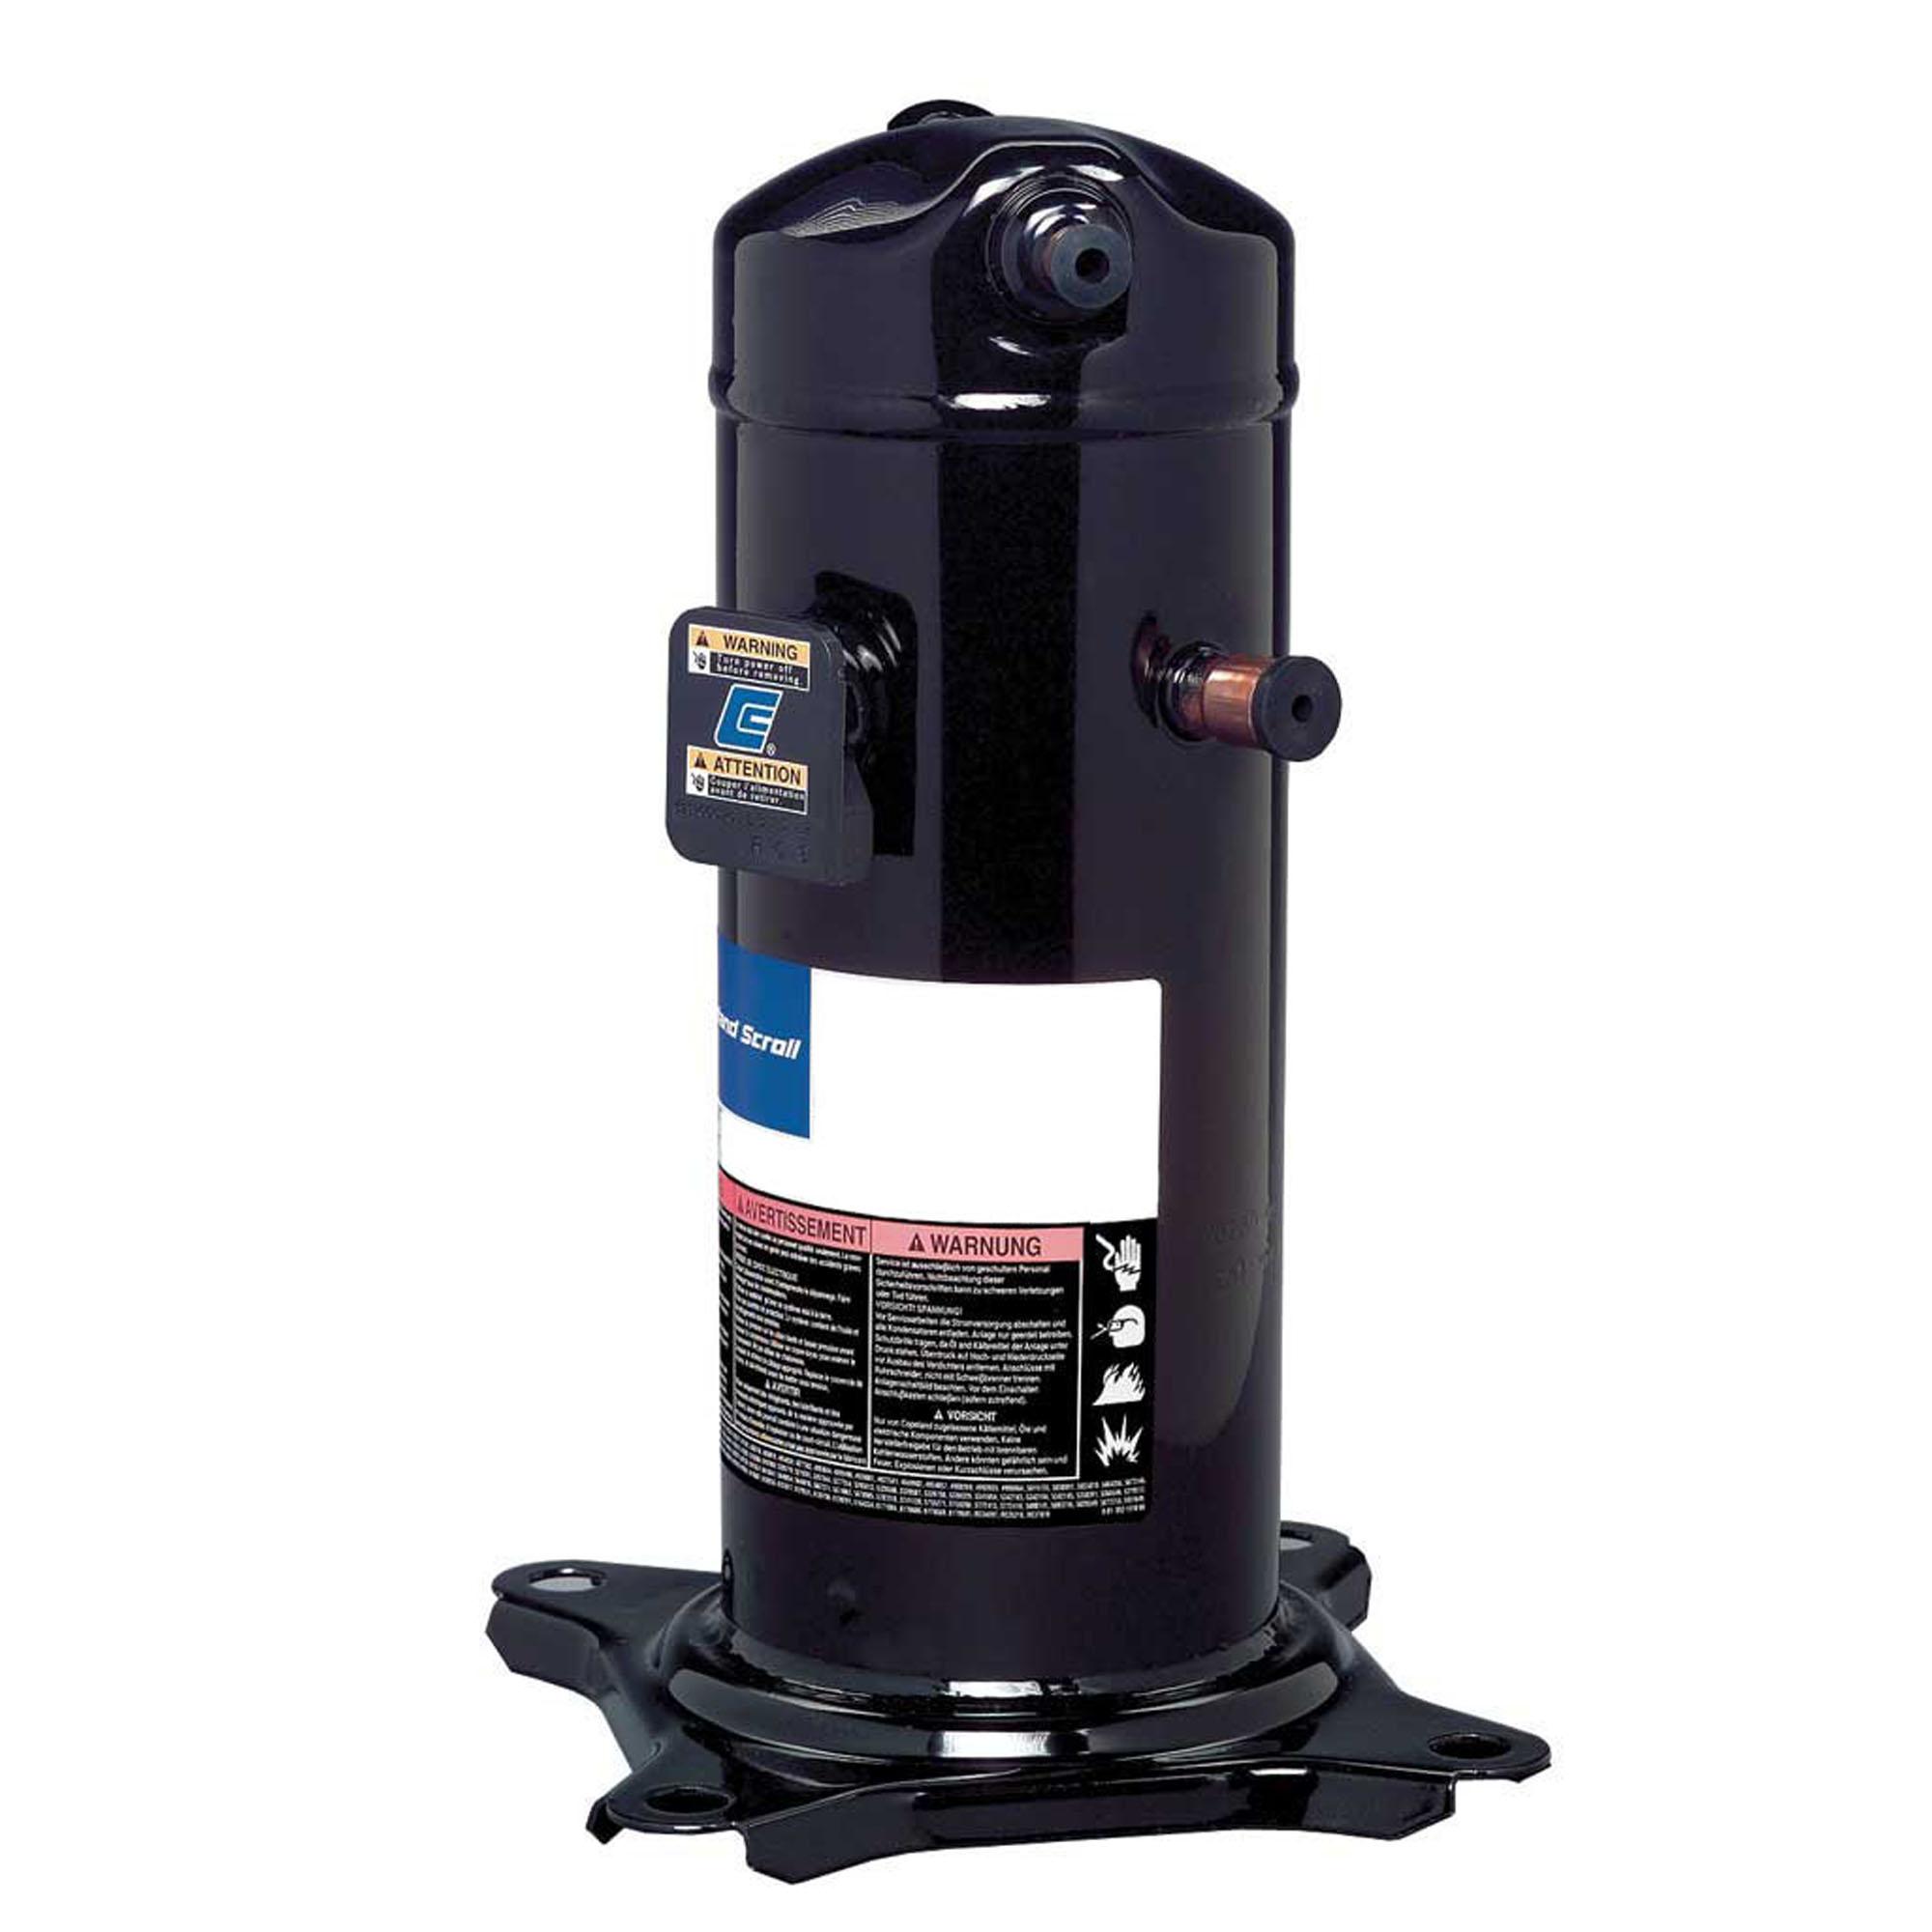 Zp61kce Tfe Copeland 3 Phase Scroll R 410a Compressor Ebay